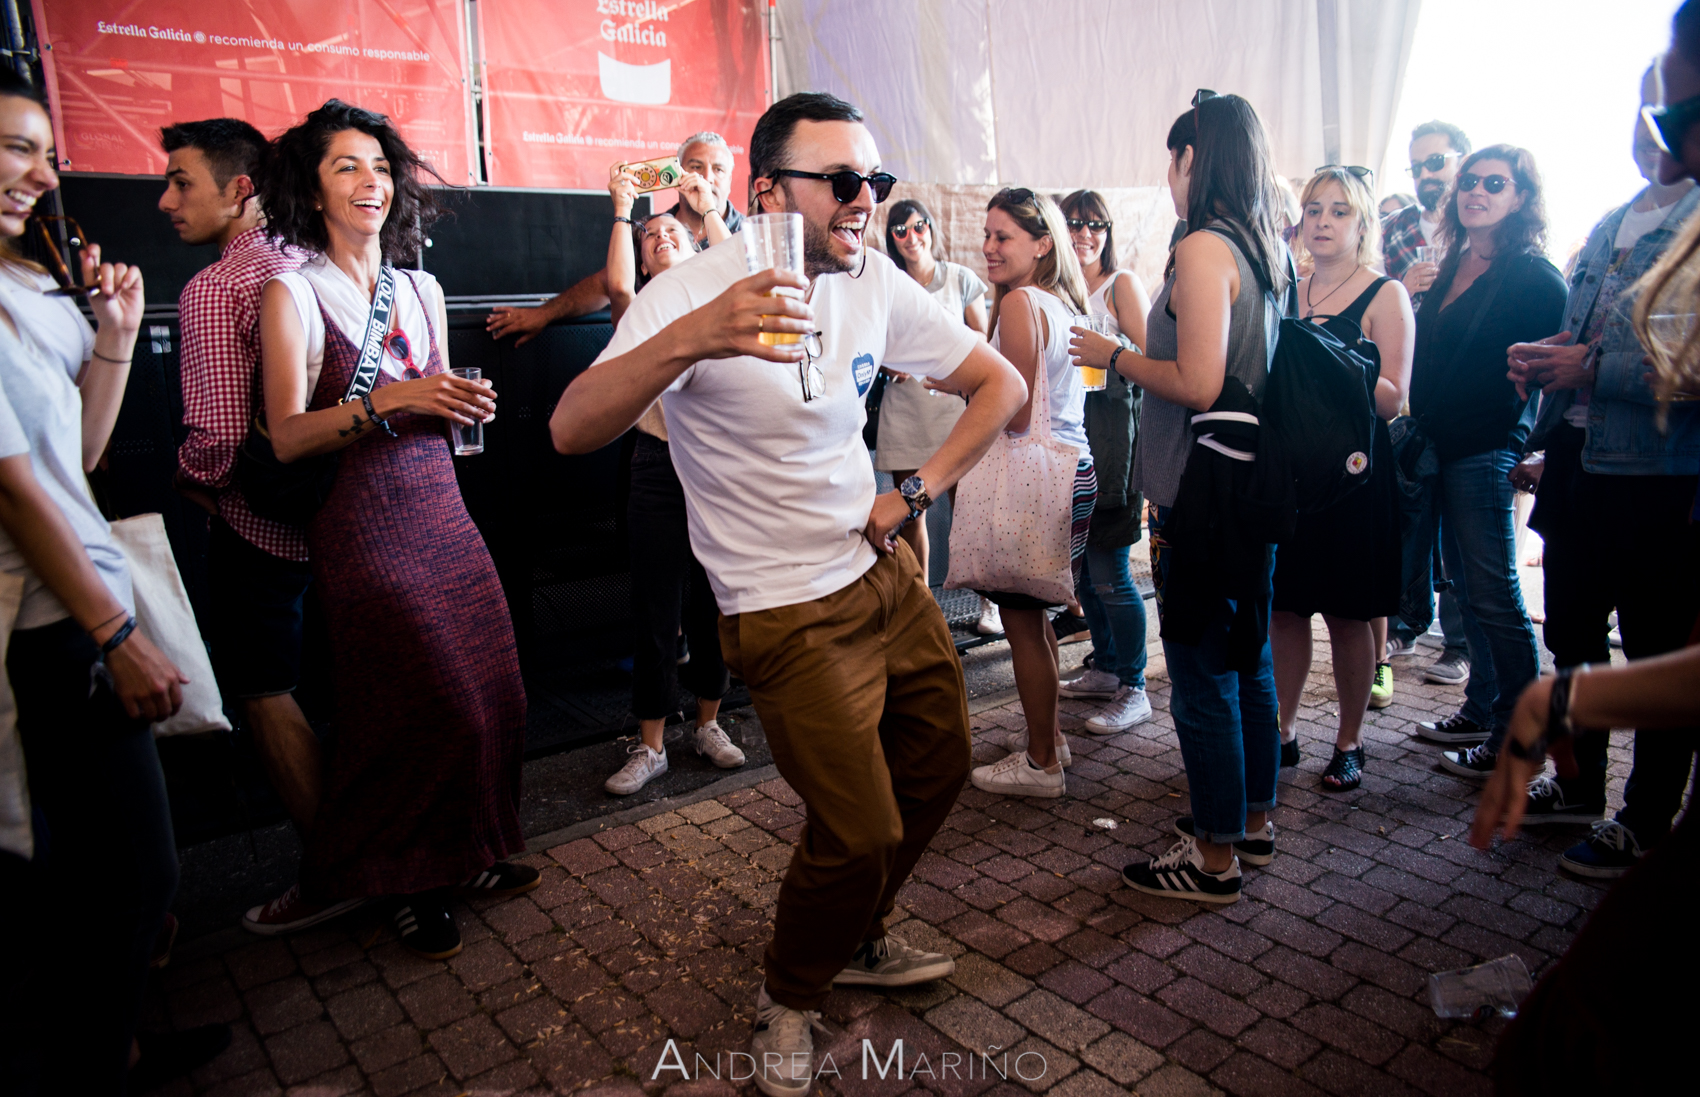 Andrea Mariño. Público. Atlantic Fest. Illa de Arousa. 2017